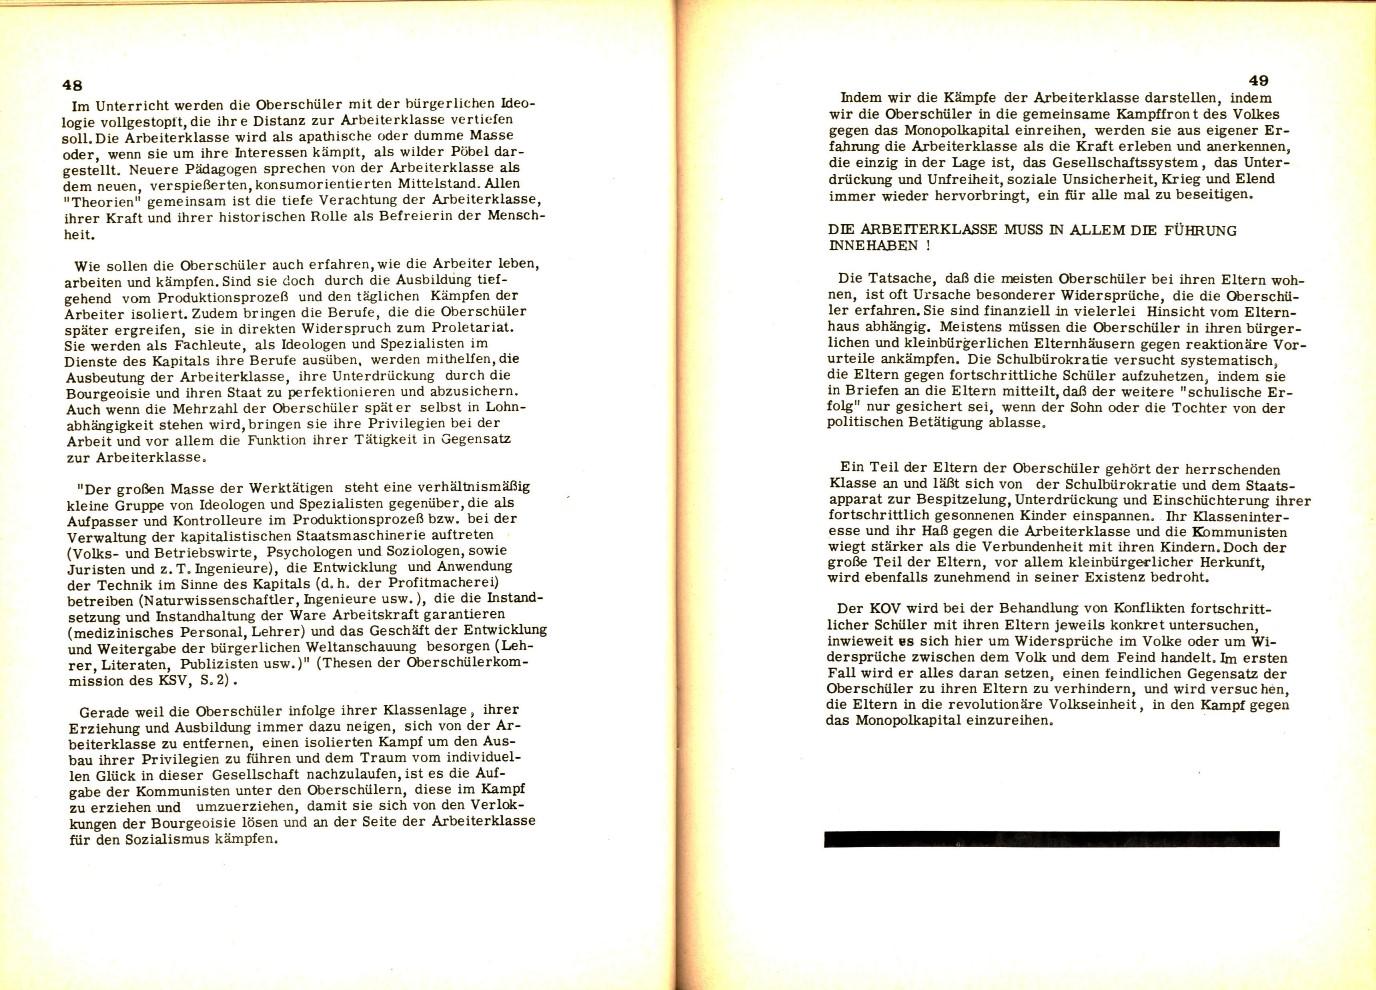 KOV_1973_Aktionsprogramm_27